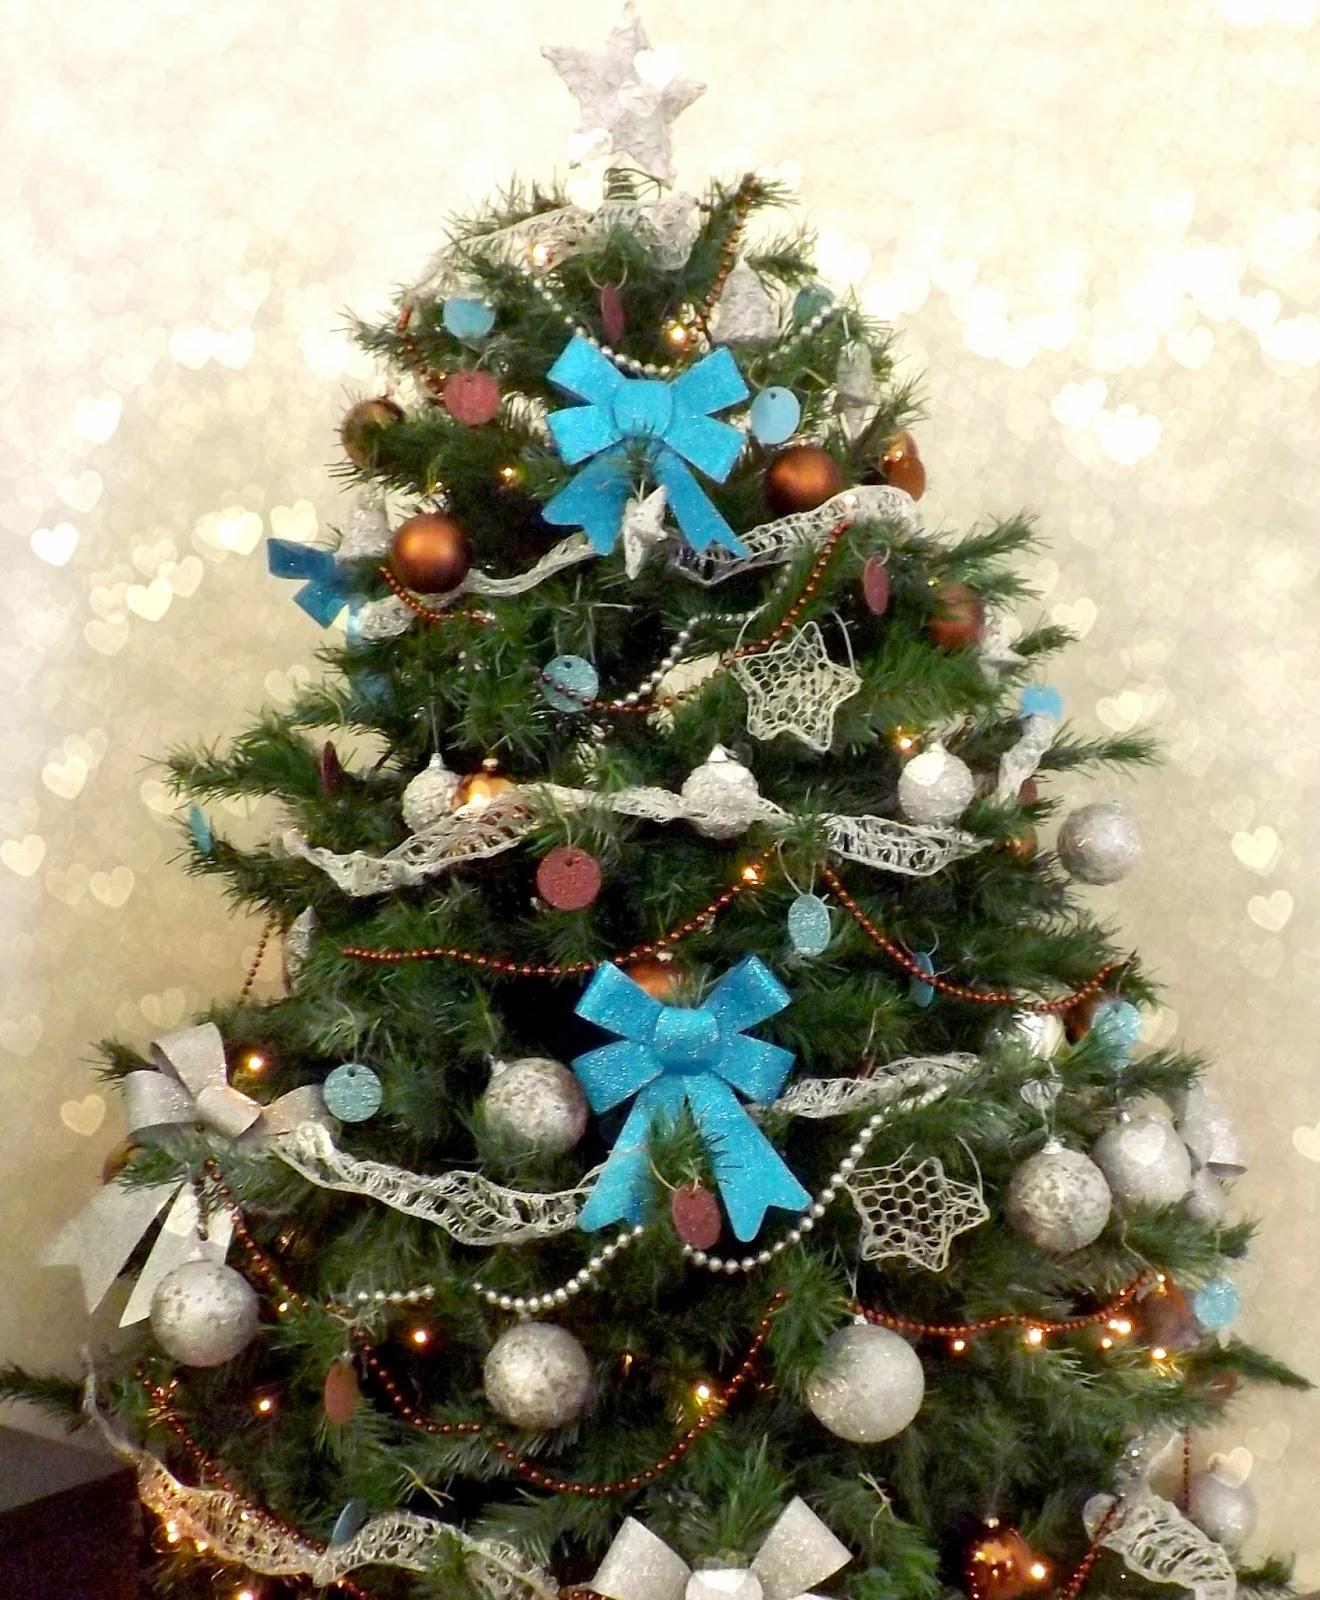 Arboles bonitos de navidad fabulous rboles de navidad que - Arboles de navidad bonitos ...